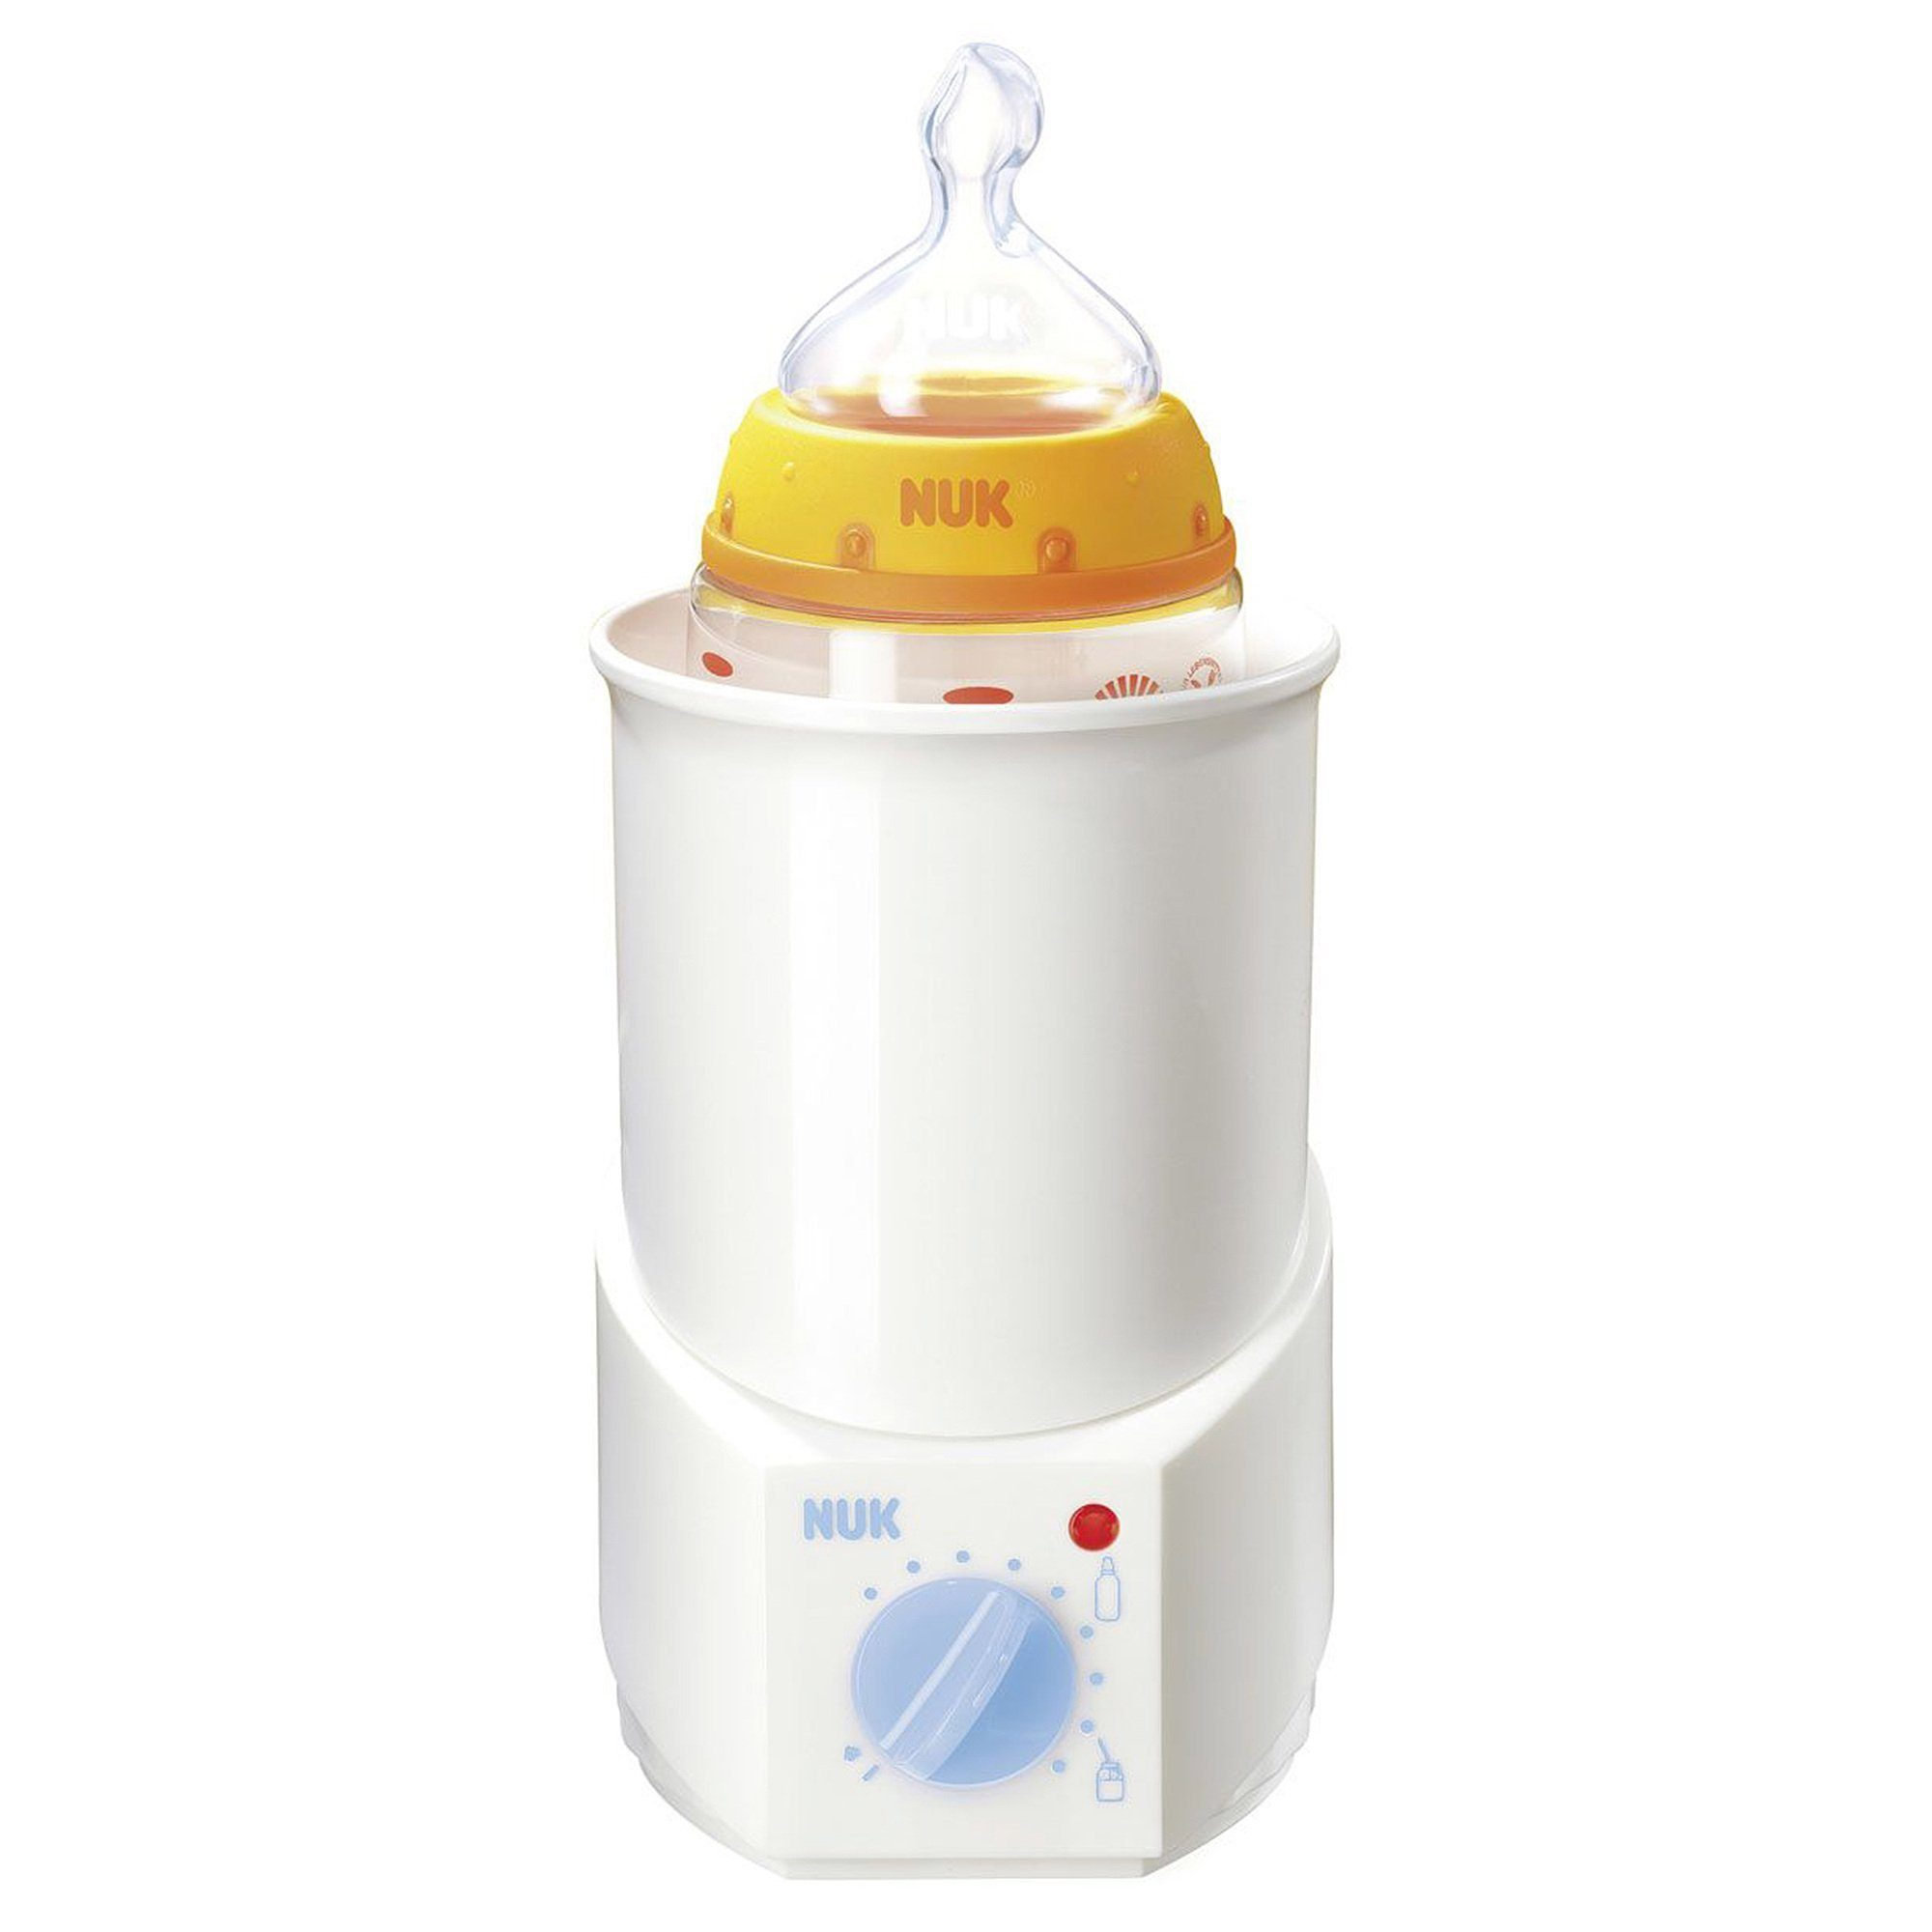 NUK Babykostwärmer mit Warmhaltefunktion